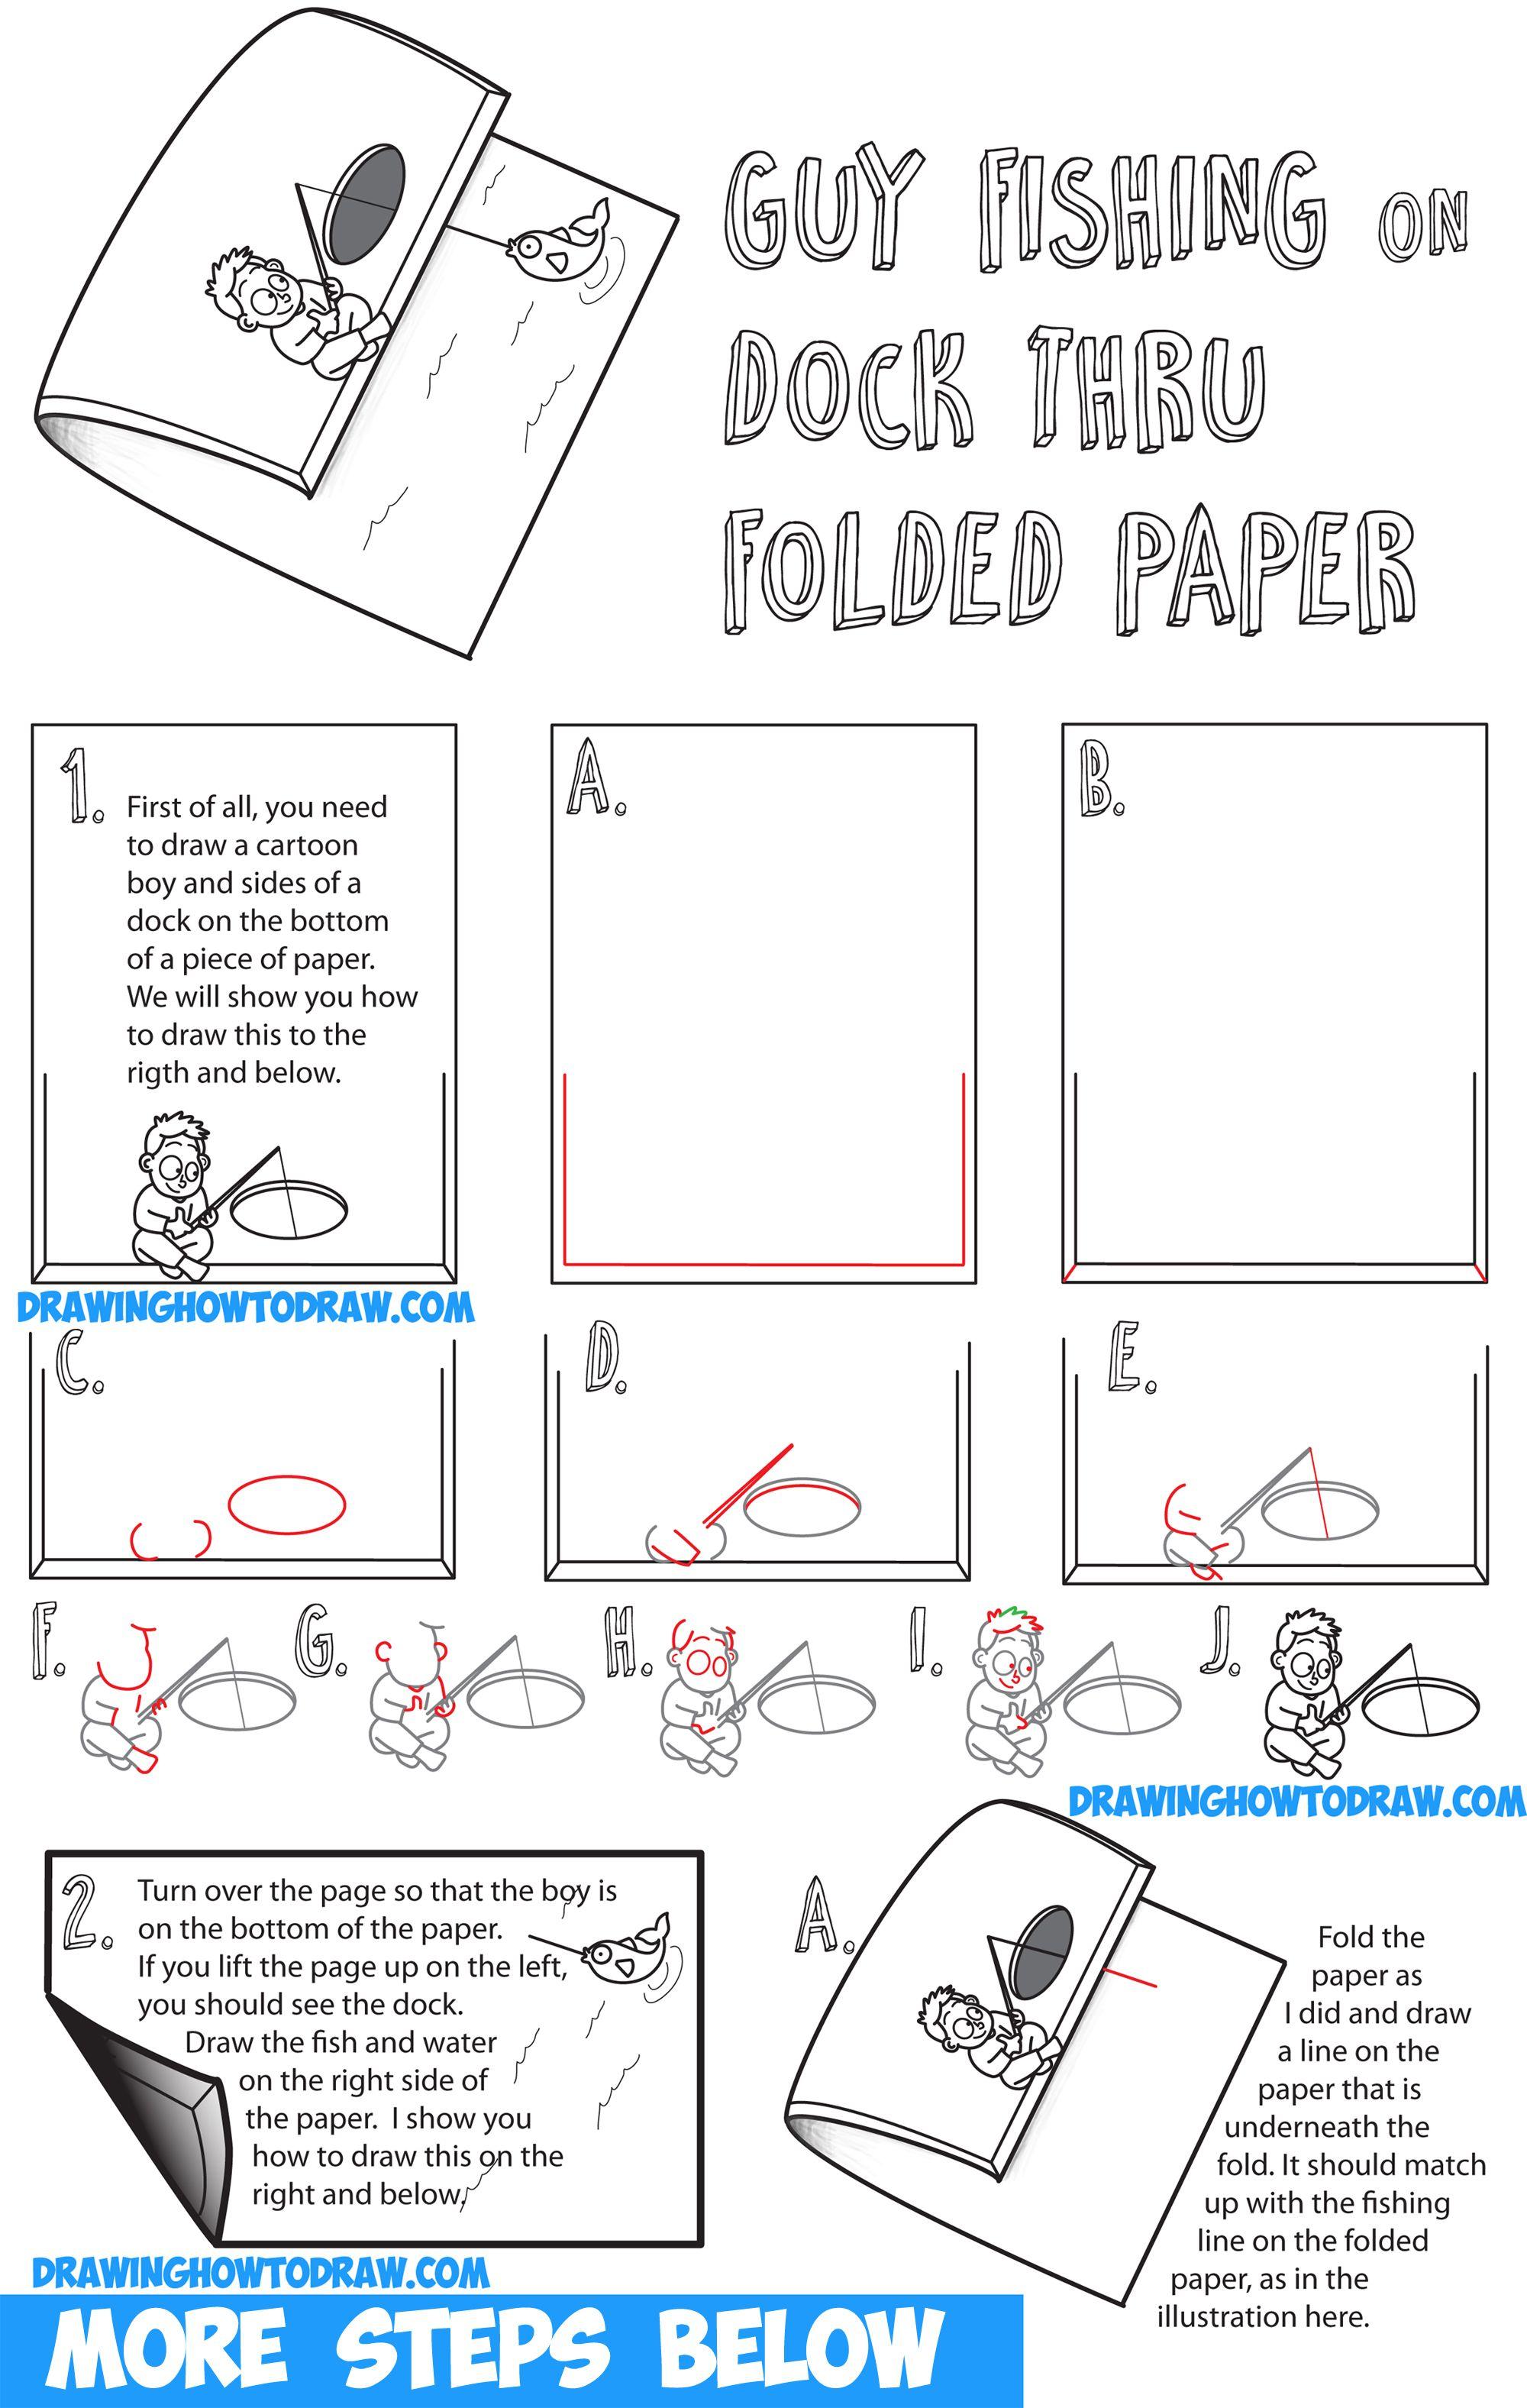 How to Draw Cartoon Boy Fishing on Dock - Optical Illusion ...